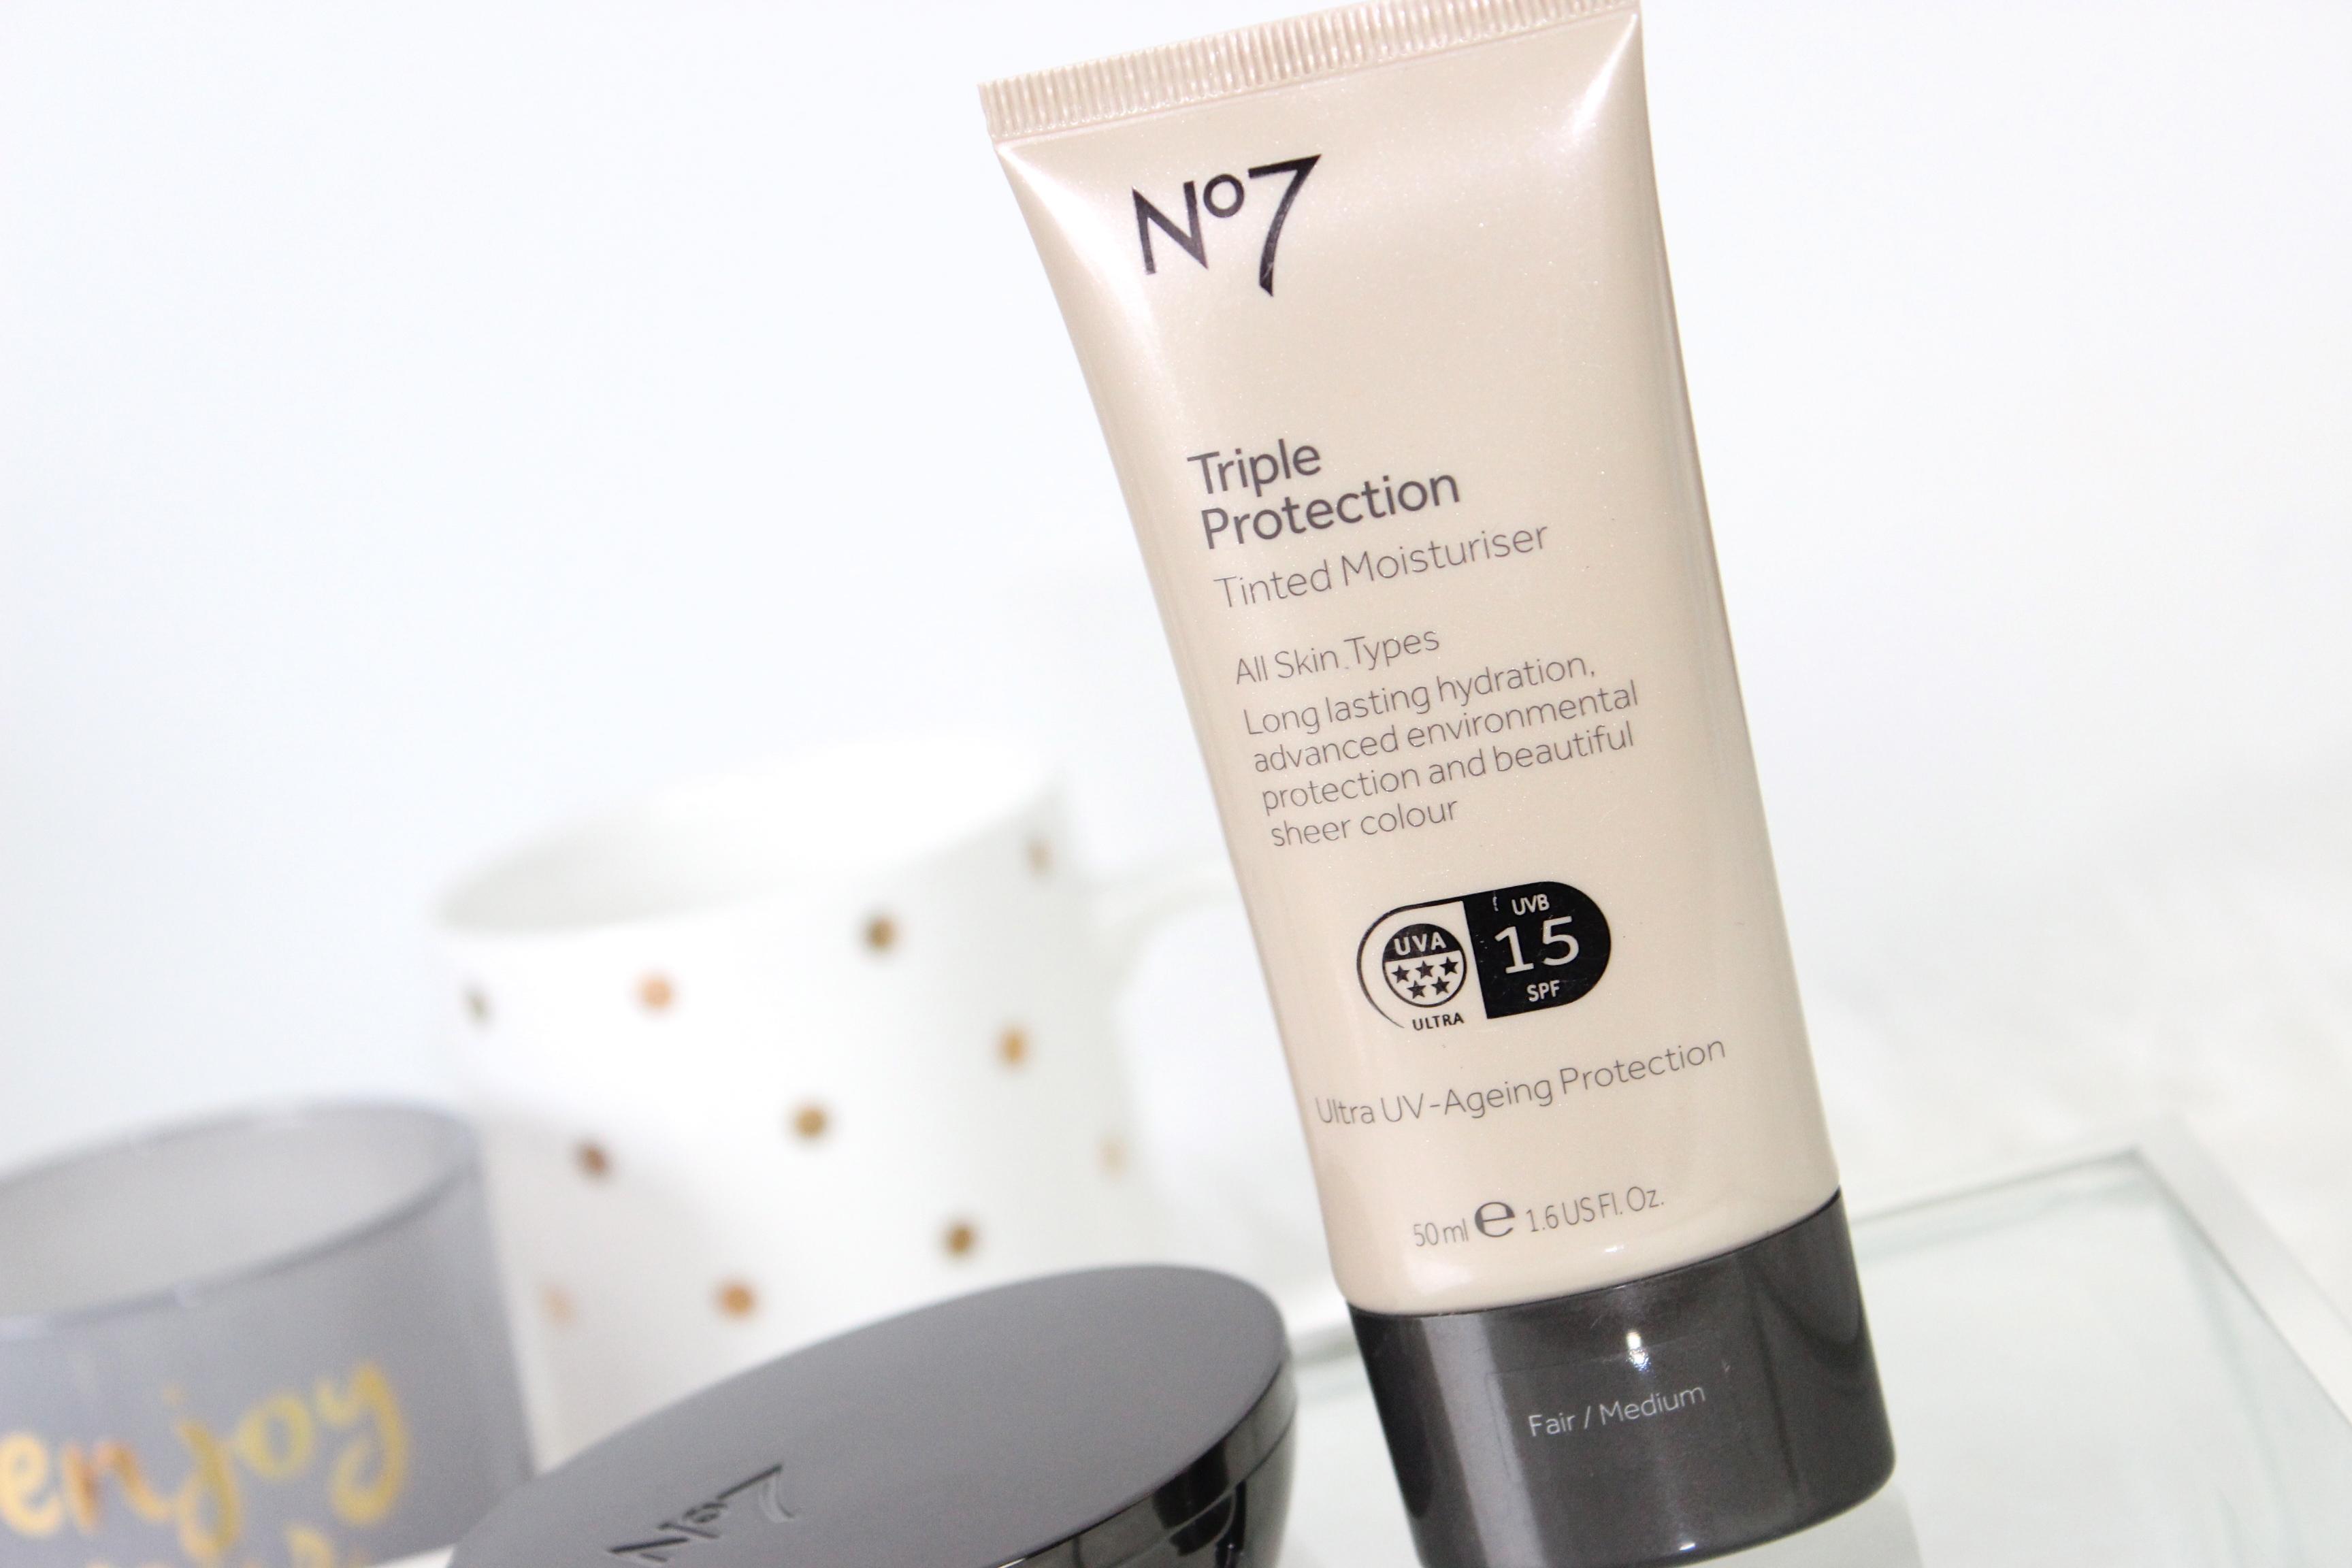 Boots no7 Triple protection tinted moisturiser fair:medium review 1